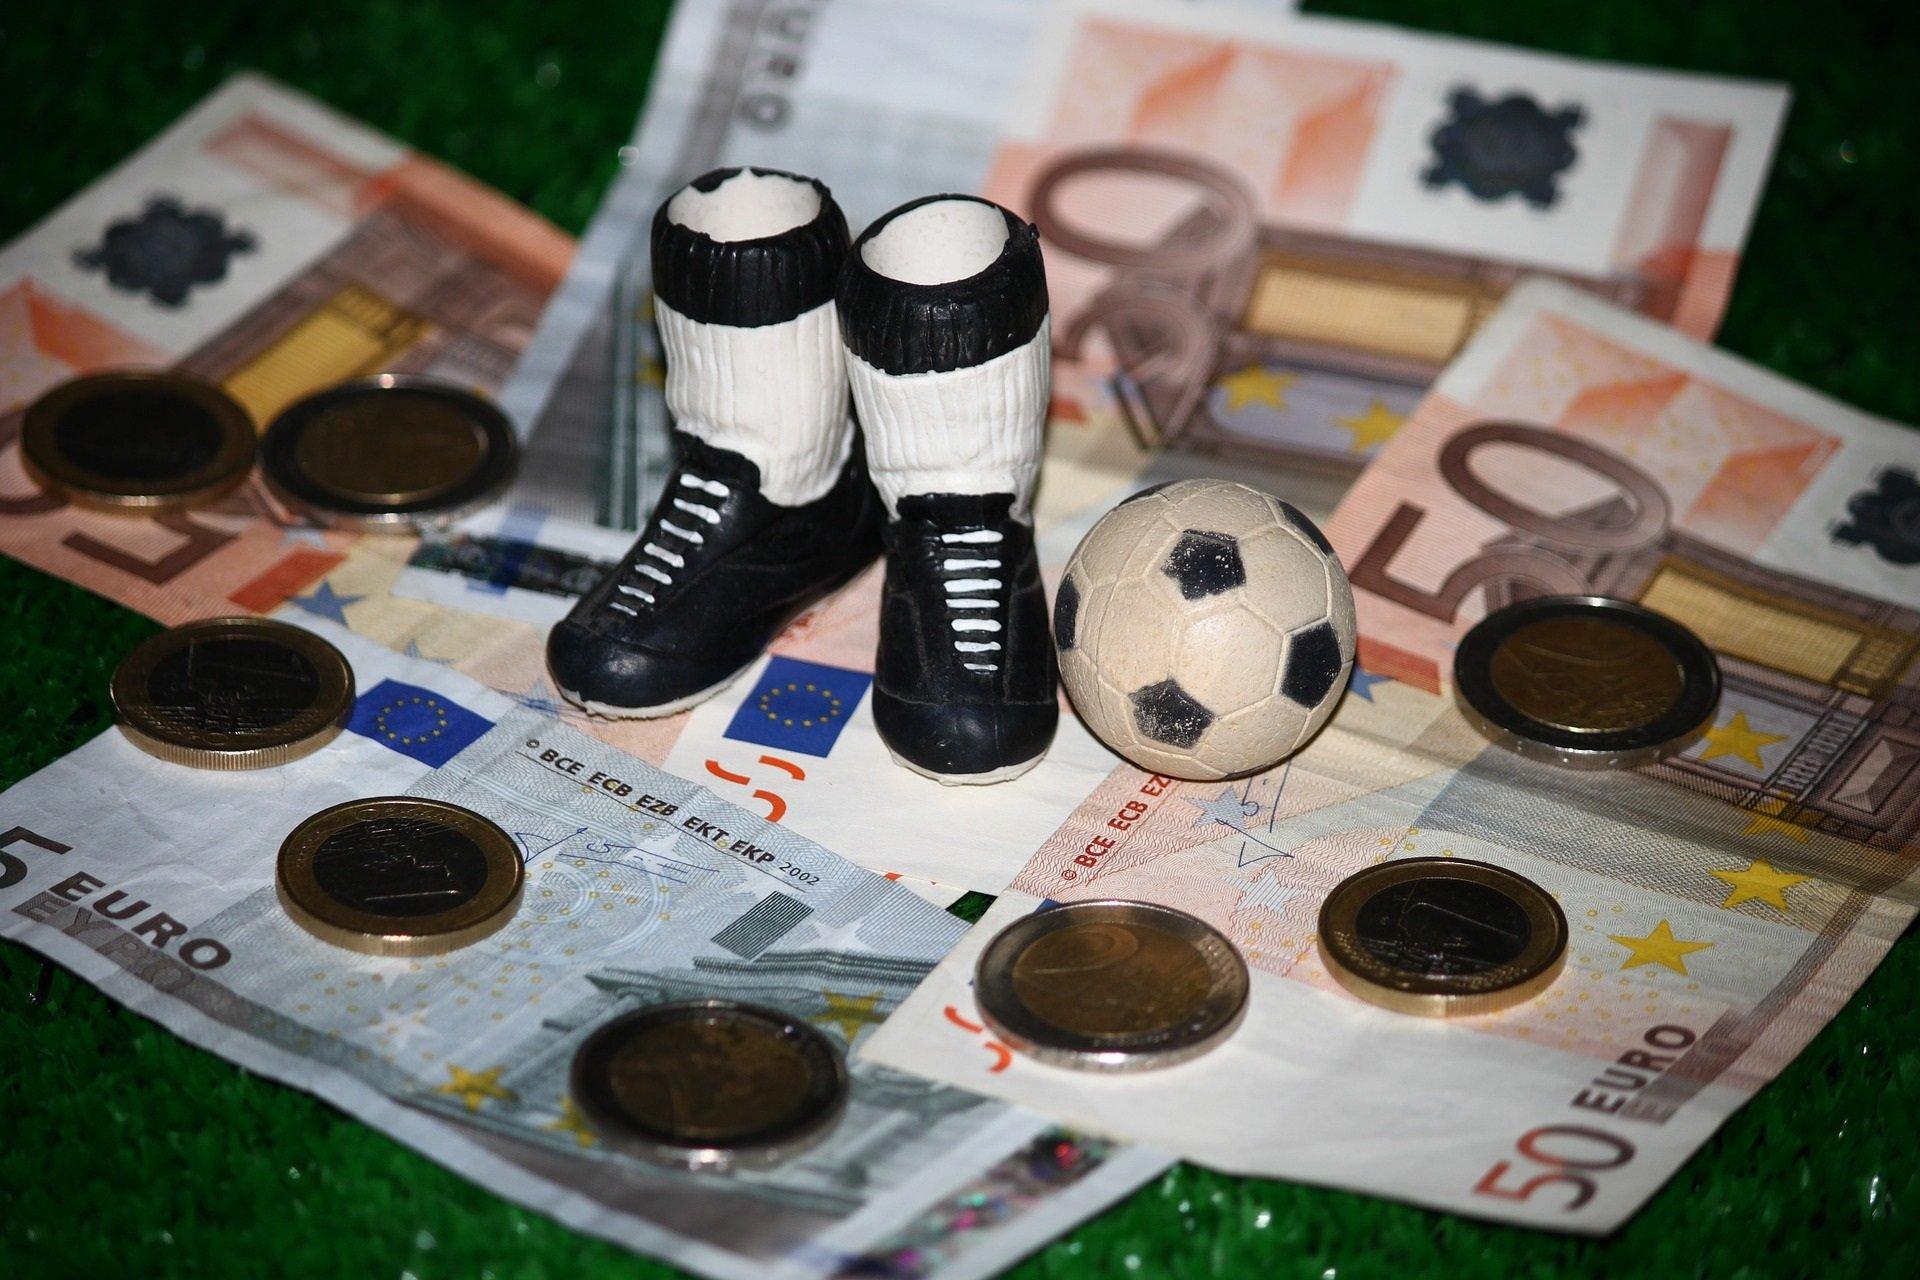 geld met speelgoedvoetbal